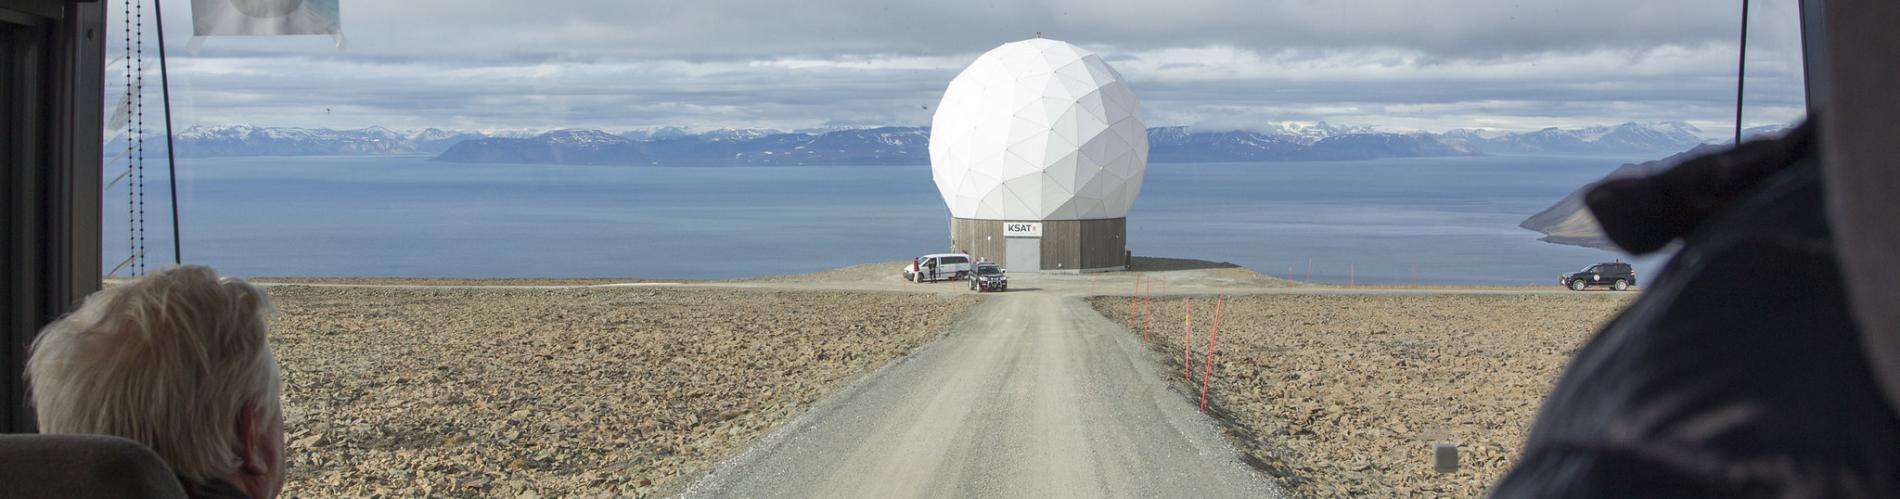 UN Photo/Rick Bajornas - Svalbard Satellite Station (SvalSat)